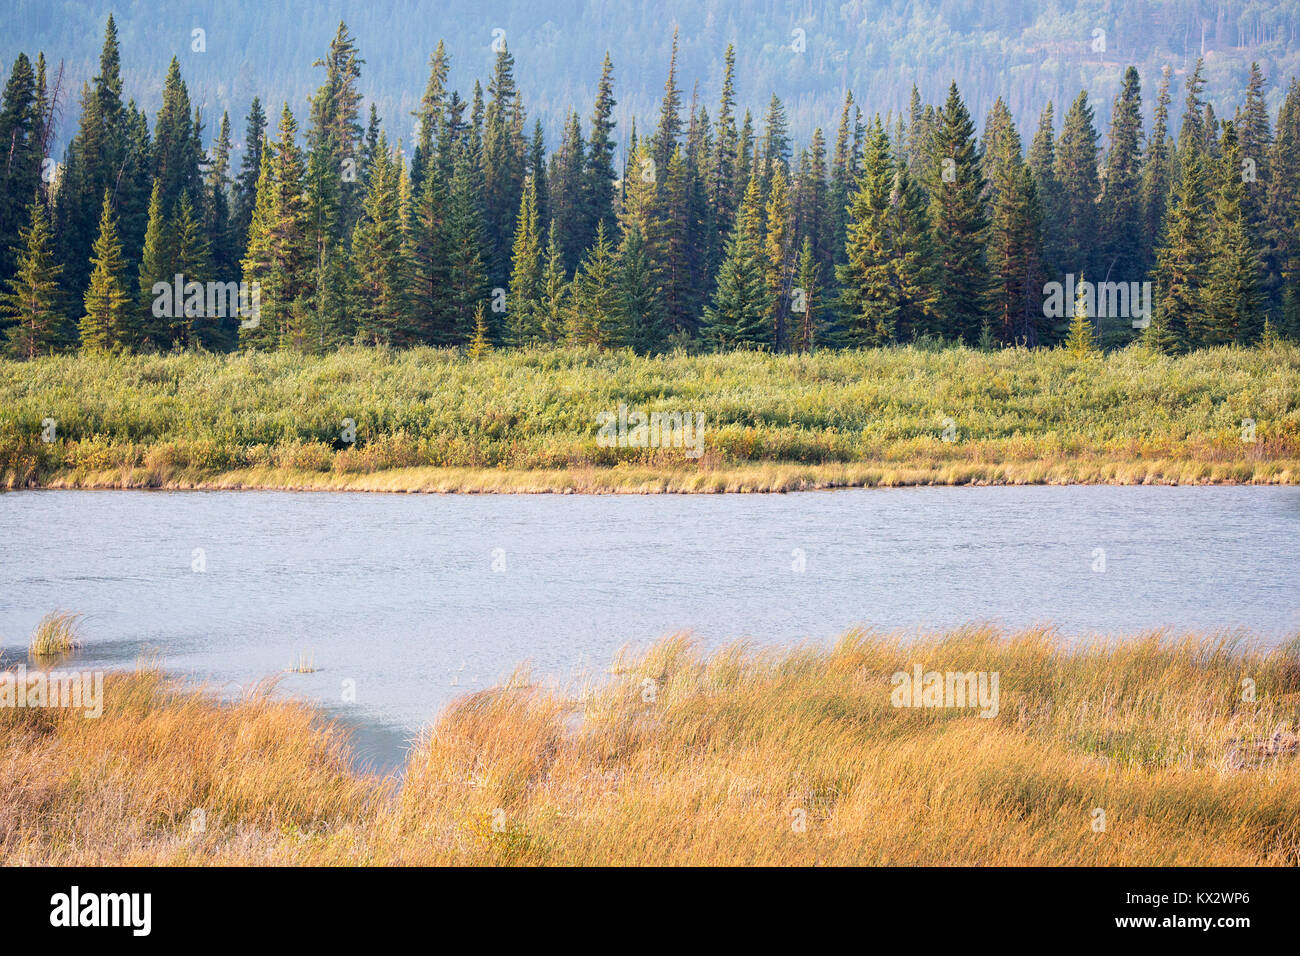 Marsh in montane ecosystem of  Banff National Park - Stock Image